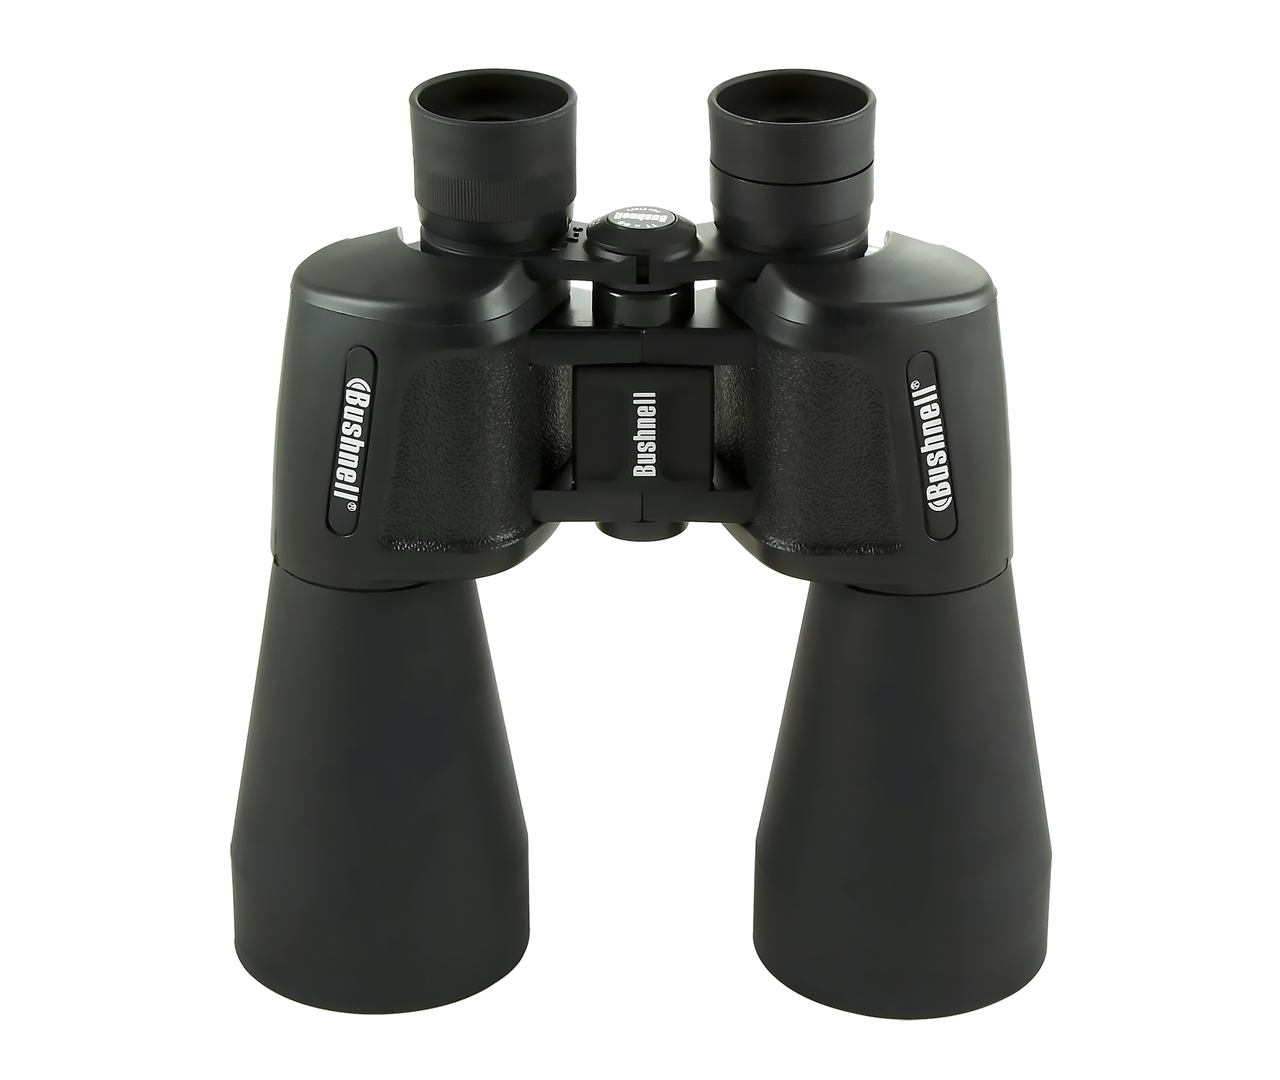 Бинокль 12X60 - BUSHNELL для любителей охоты